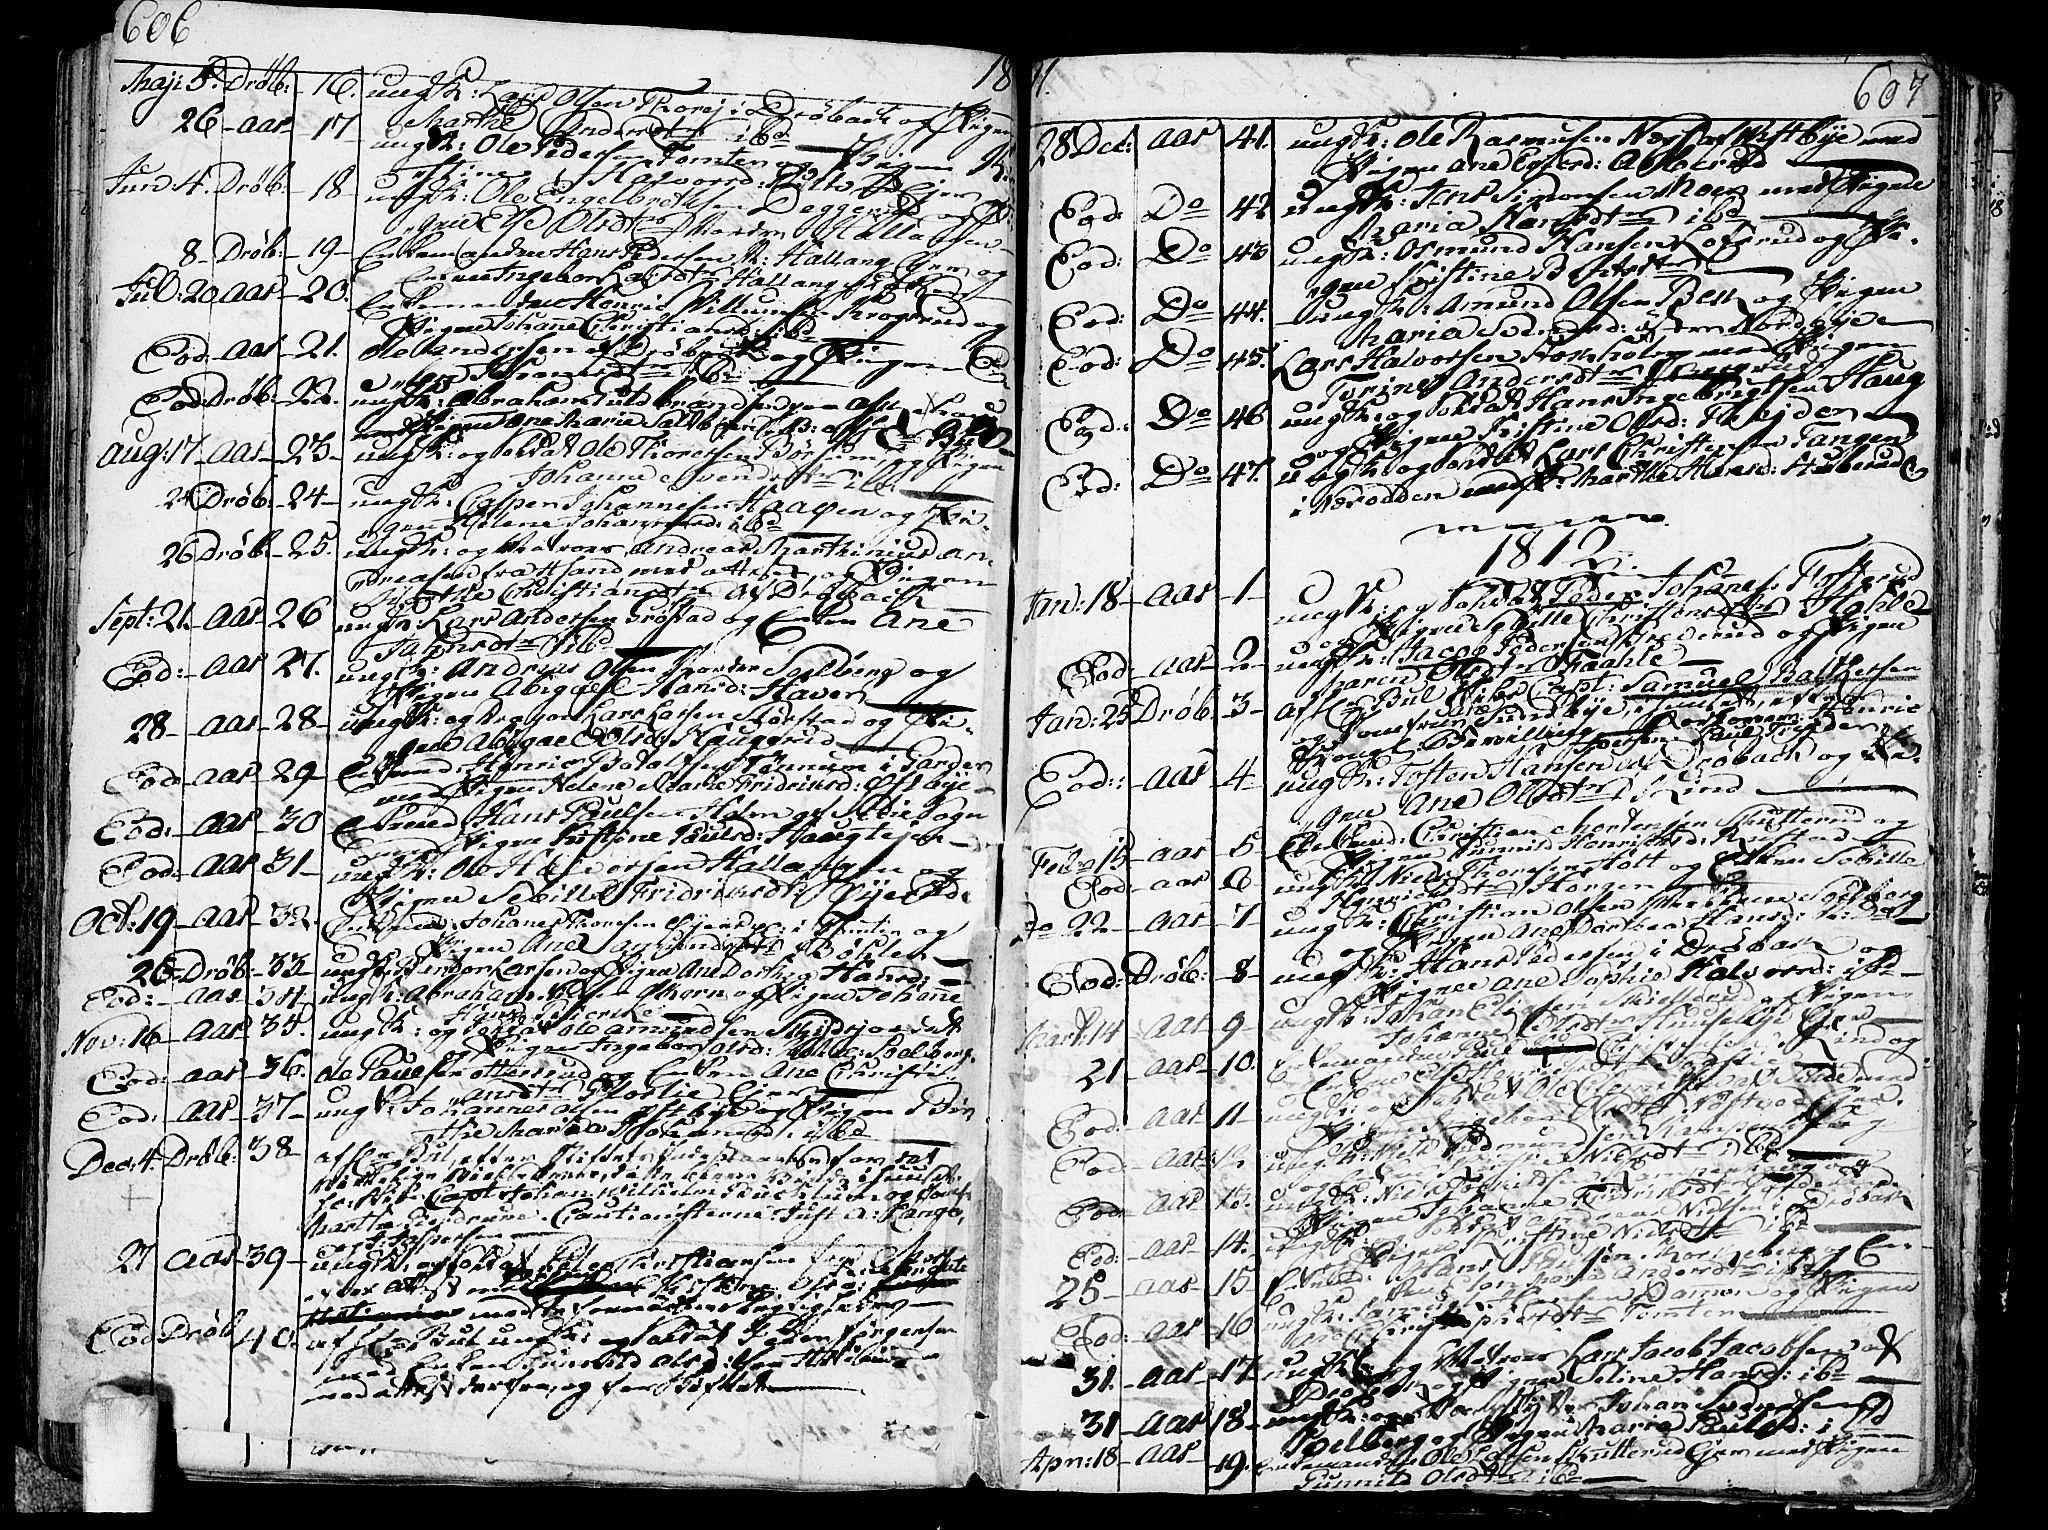 SAO, Ås prestekontor Kirkebøker, F/Fa/L0002: Ministerialbok nr. I 2, 1778-1813, s. 606-607